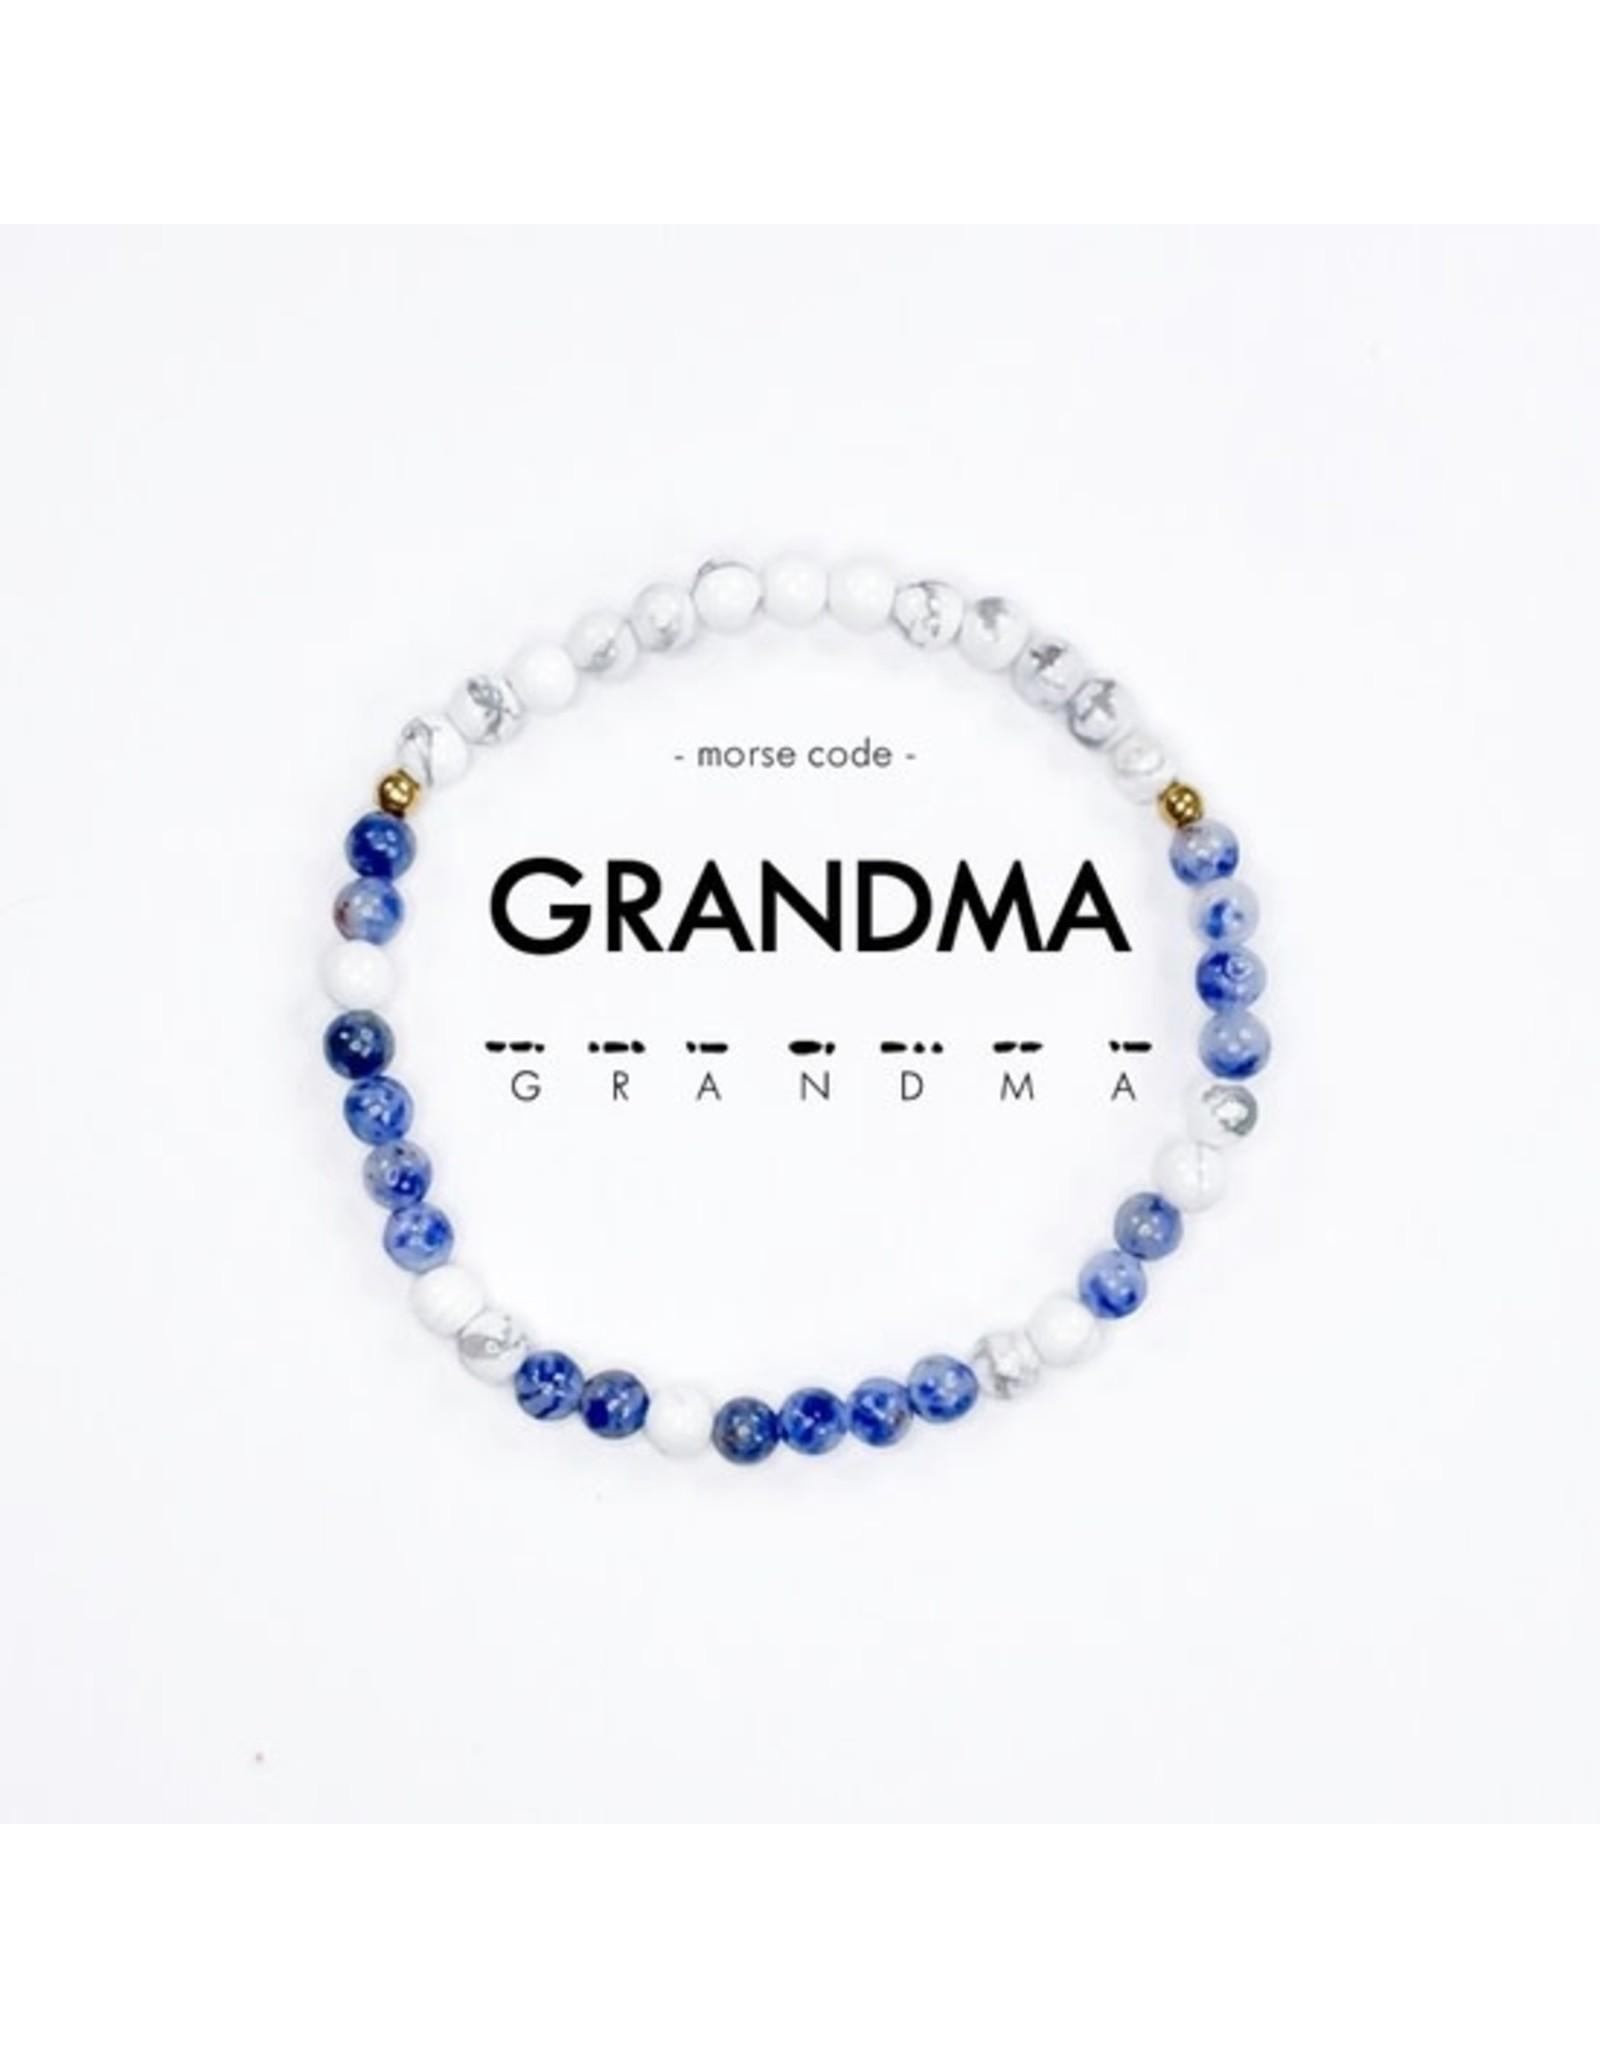 Grandma Morse Code Bracelet